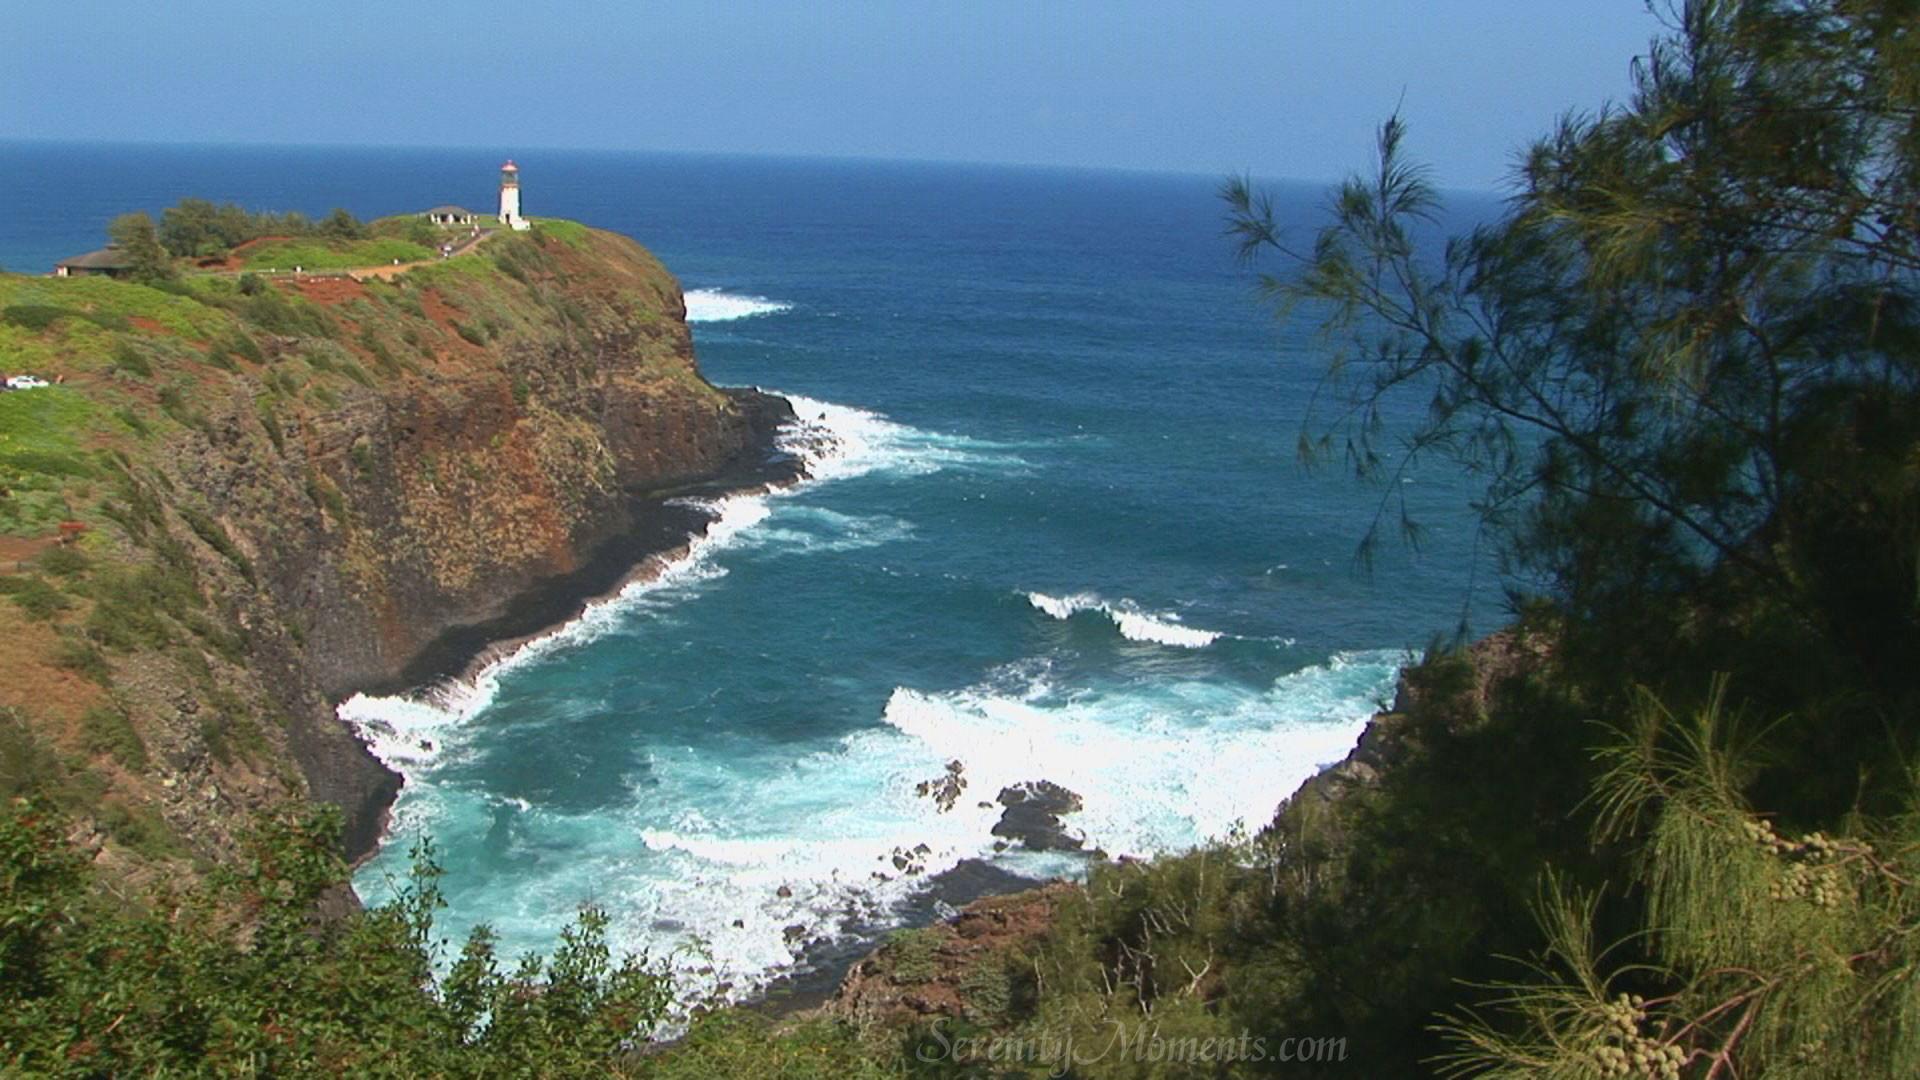 Kauai Lighthouse, Hawaii Screensaver